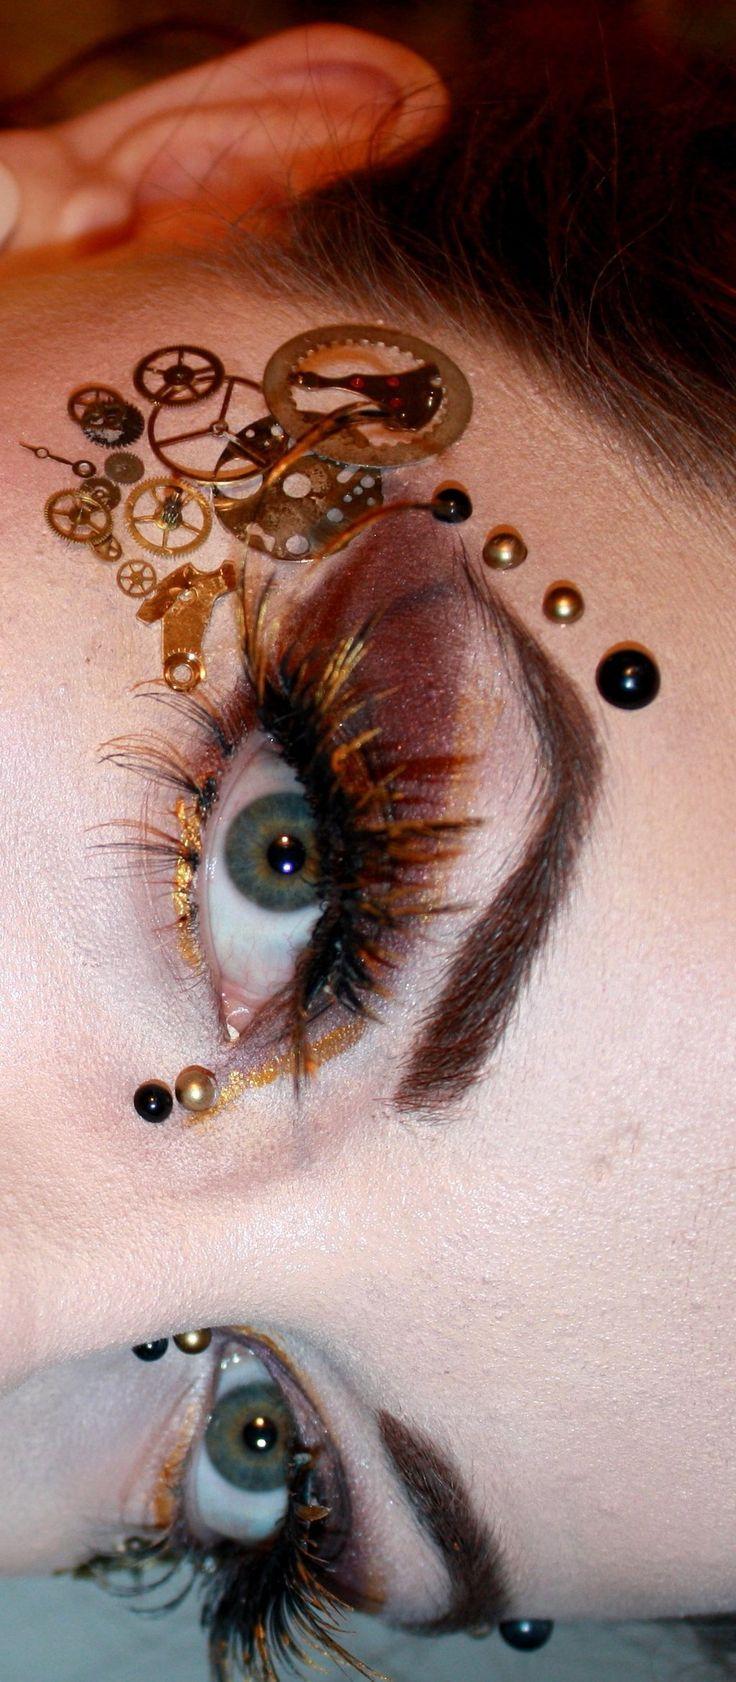 Steampunk Makeup by AmbieDrew.deviantart.com on @deviantART